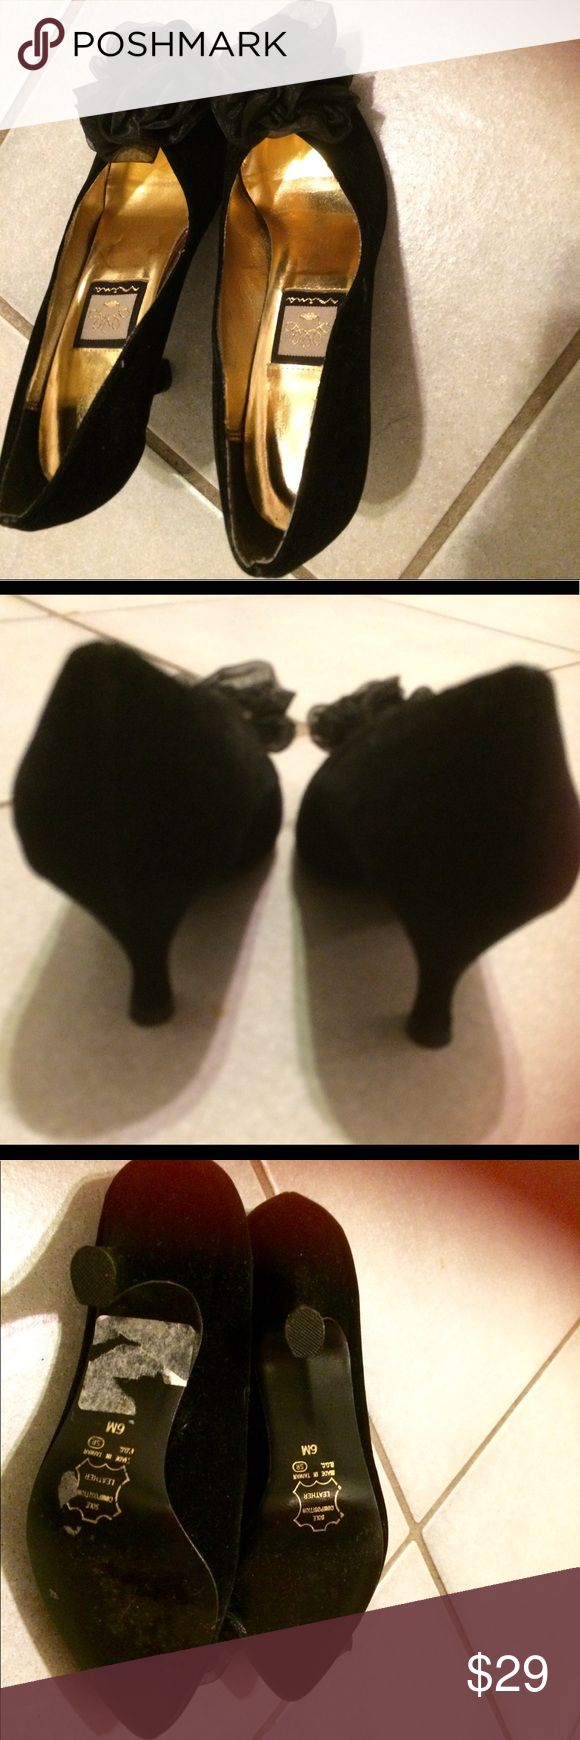 Ladies Nina Black Dress Shoes size 6 Ladies Nina black dress shoes size 6 size leather soles 3 inch heels, worn a few times. Excellent condition Nina Shoes Heels